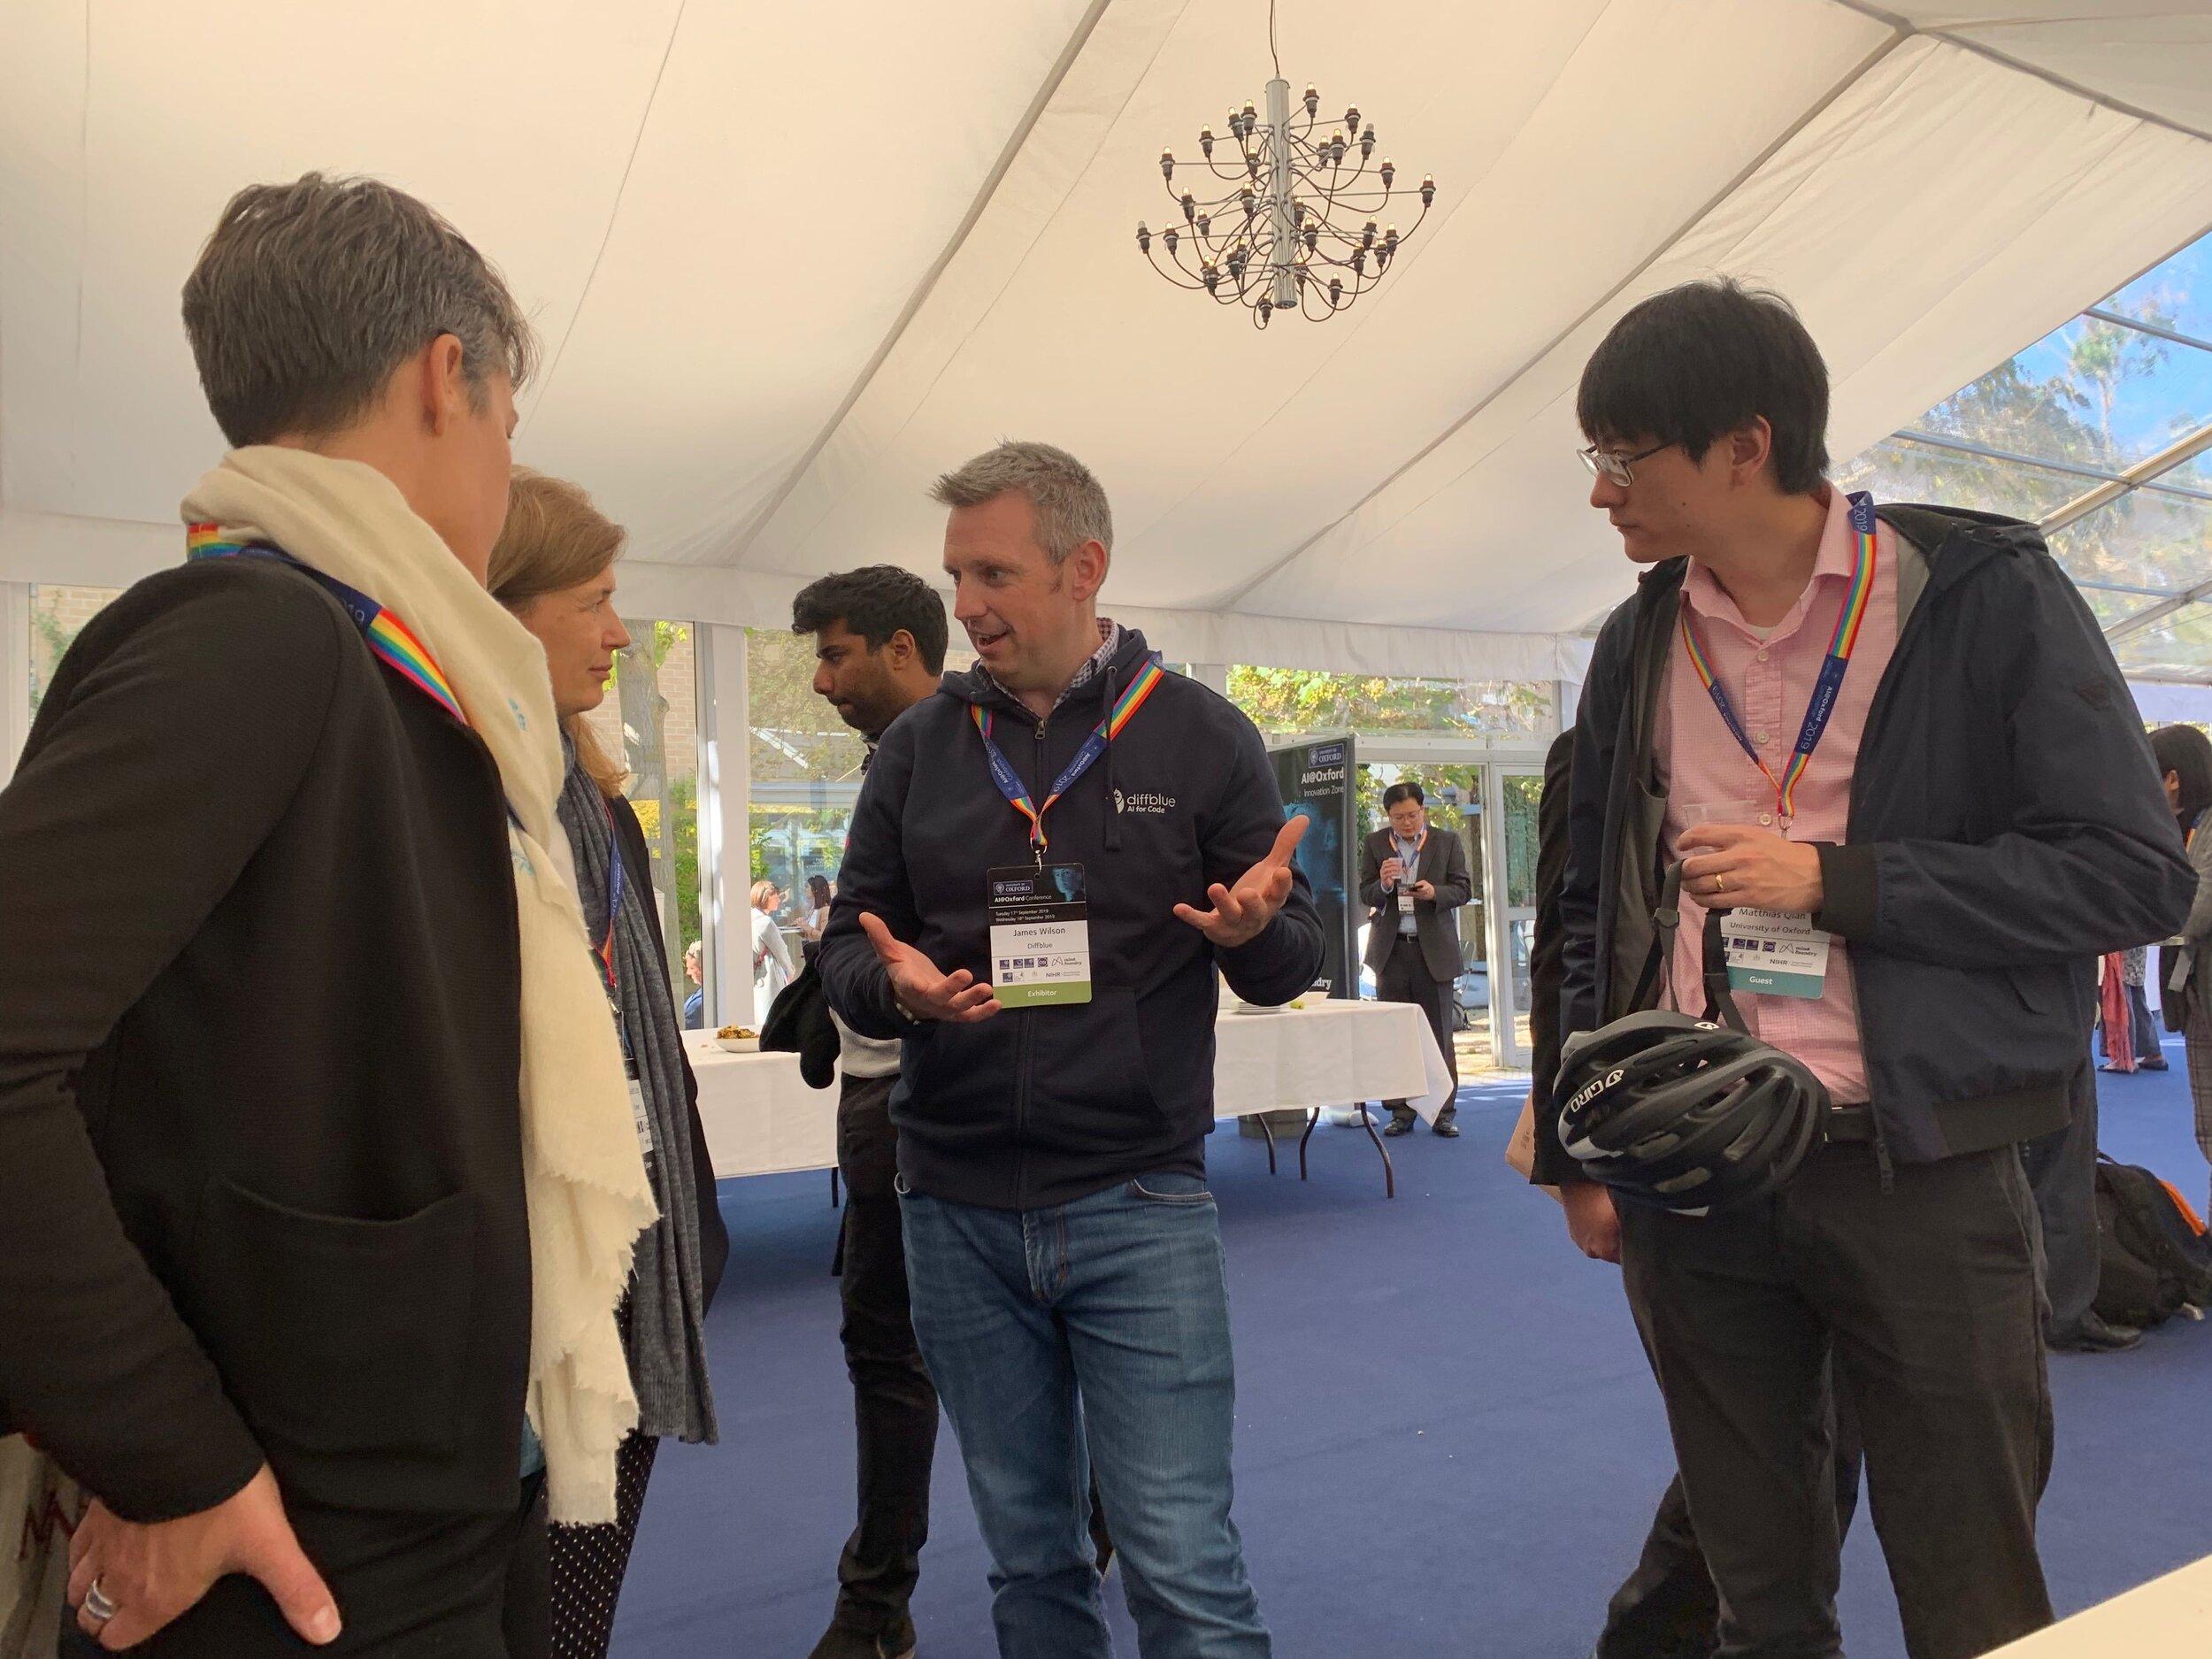 James Wilson, Director of Customer Success at Diffblue, meeting guests at AI@Oxford